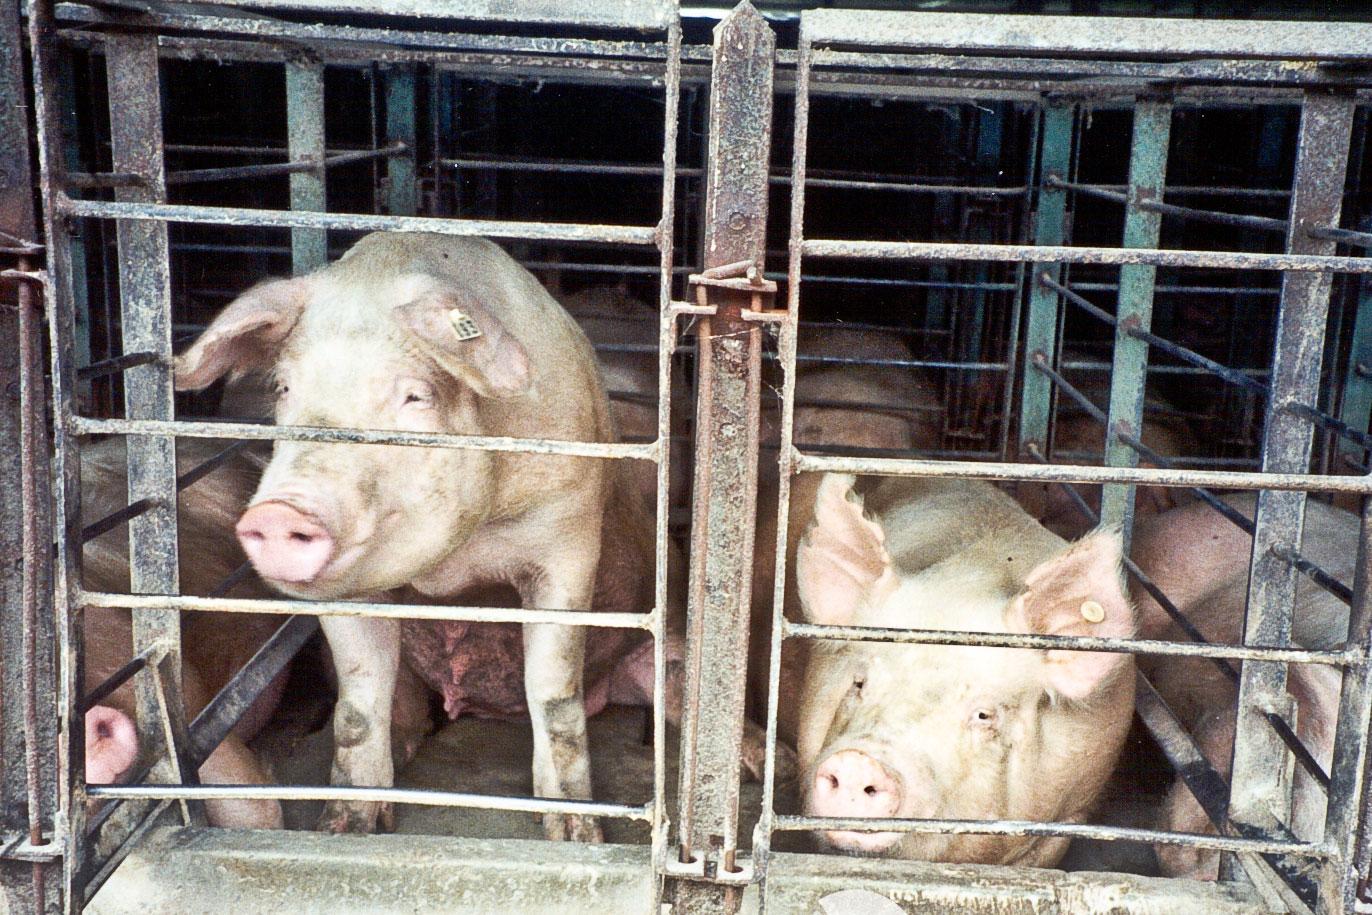 pork gestation crates